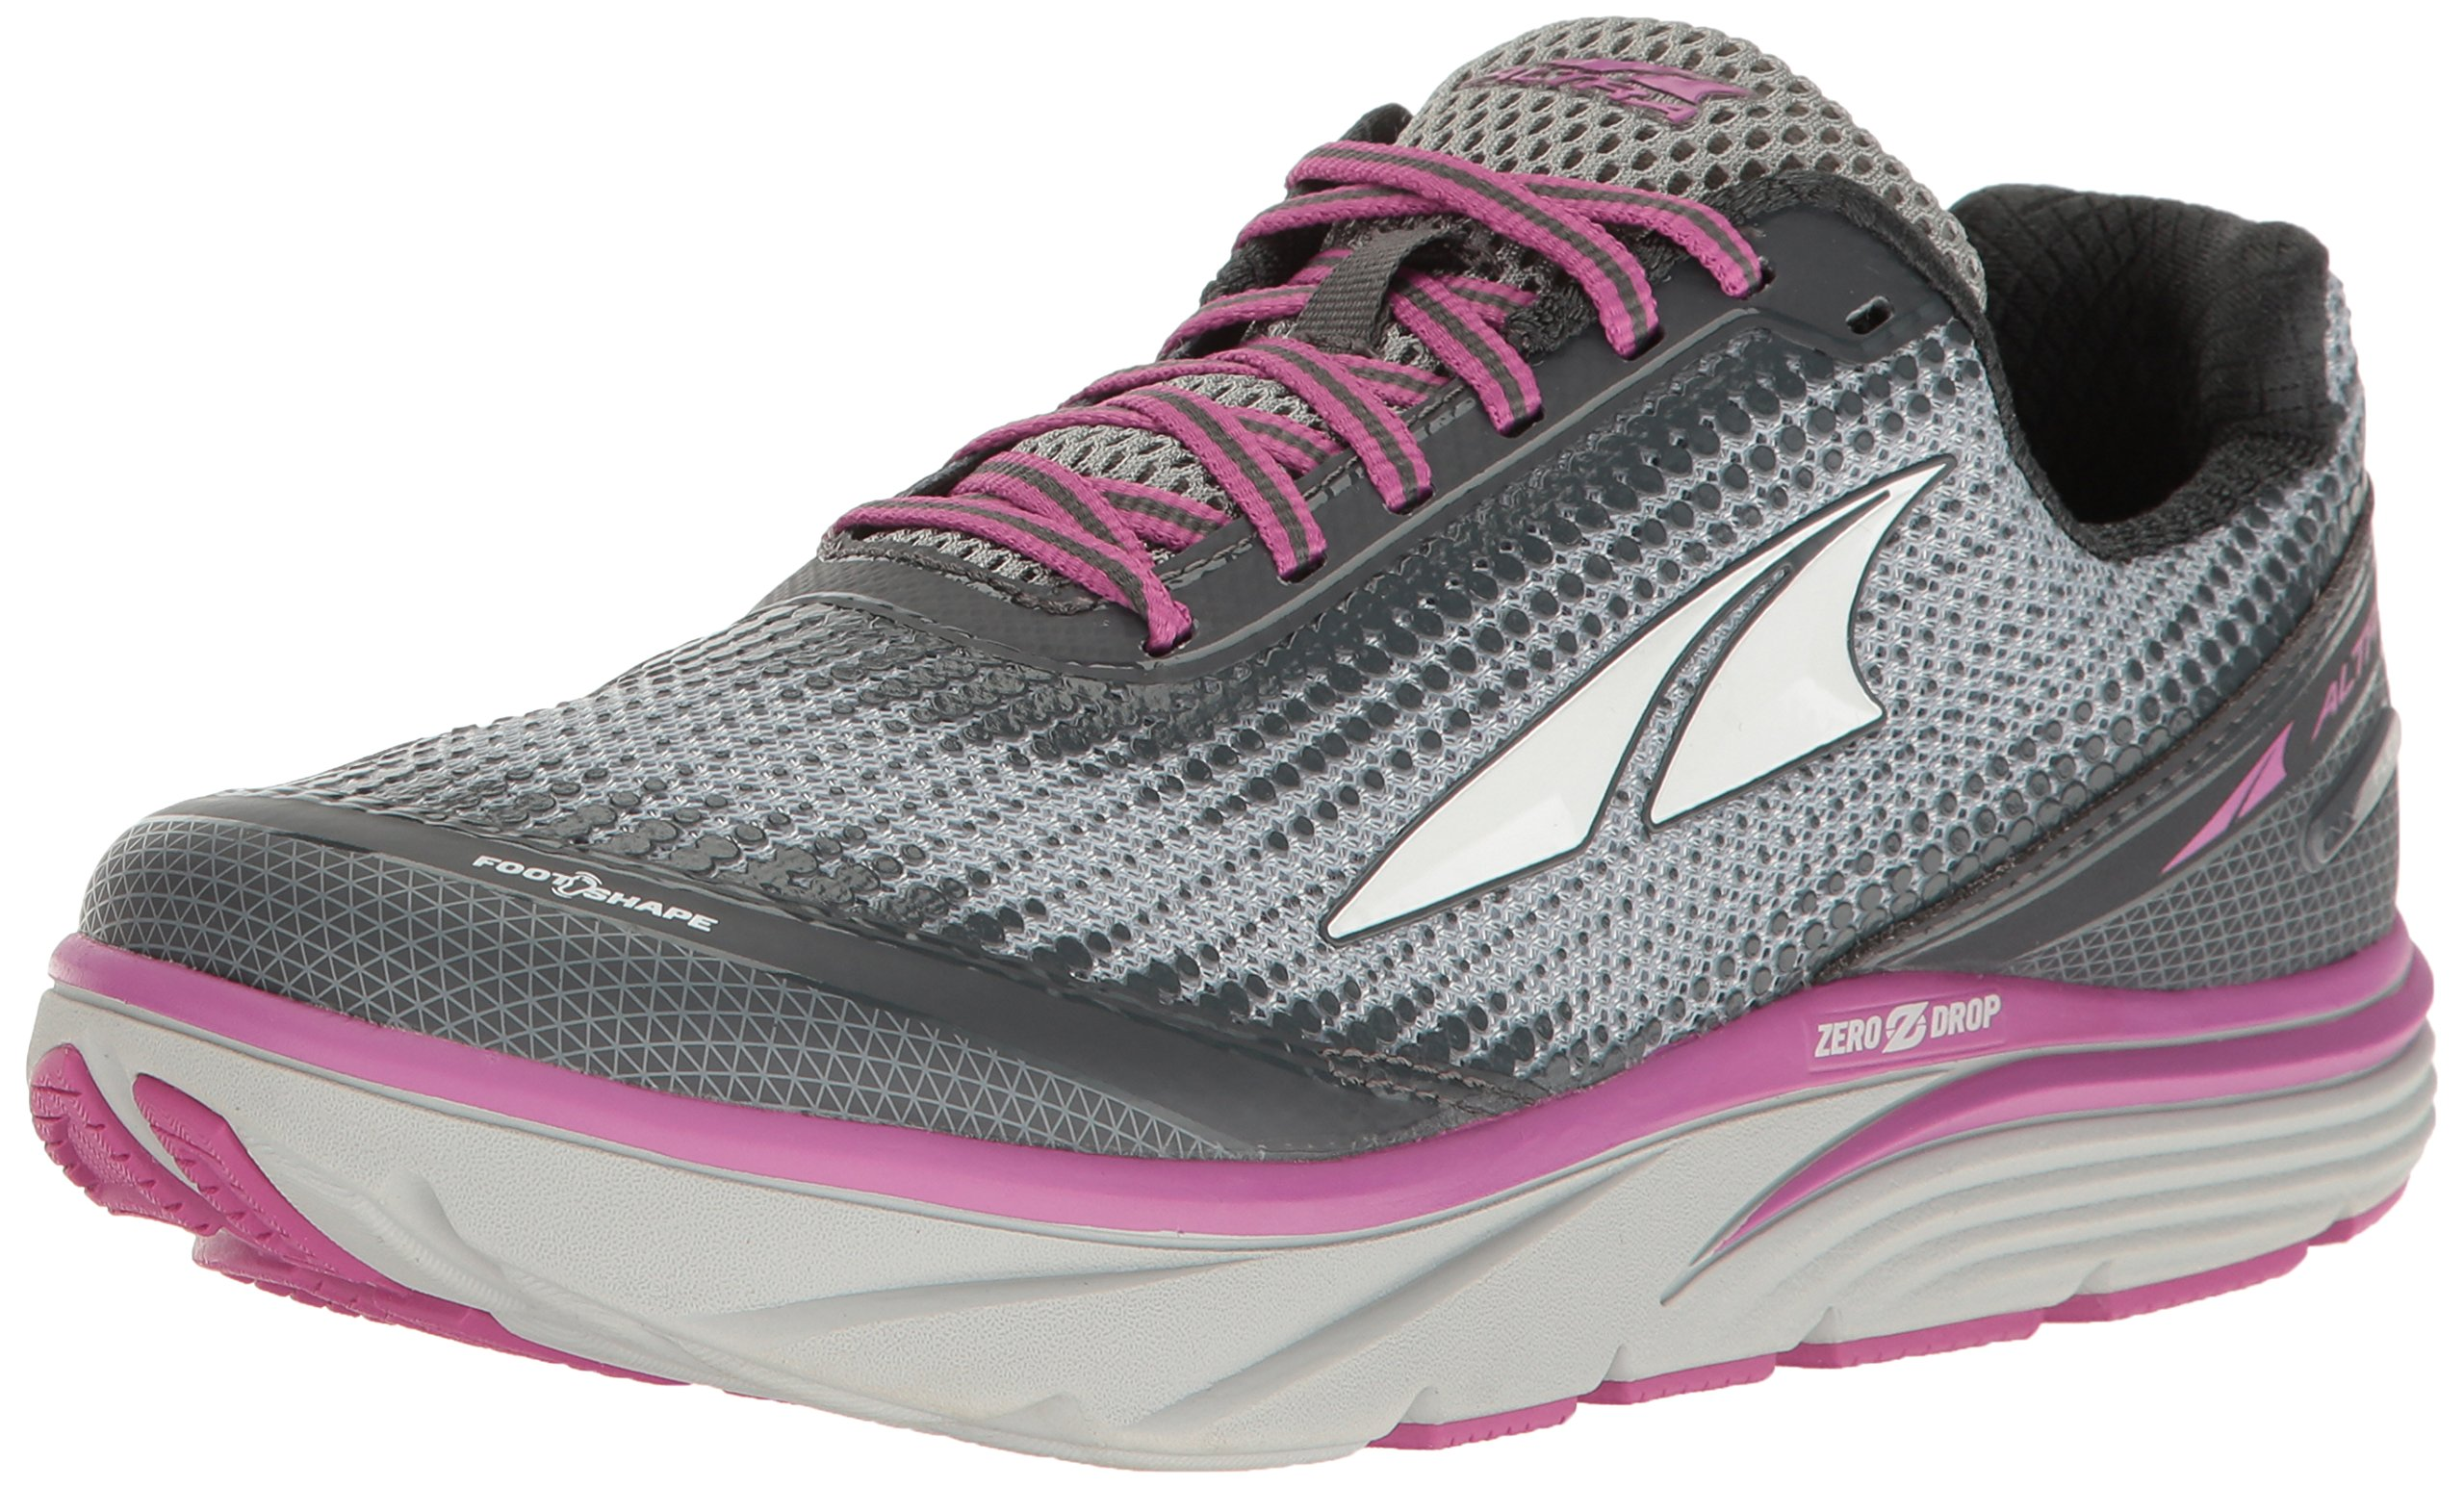 Altra Women's Torin 3 Road Running Shoe, Gray/Pink - 8 B US